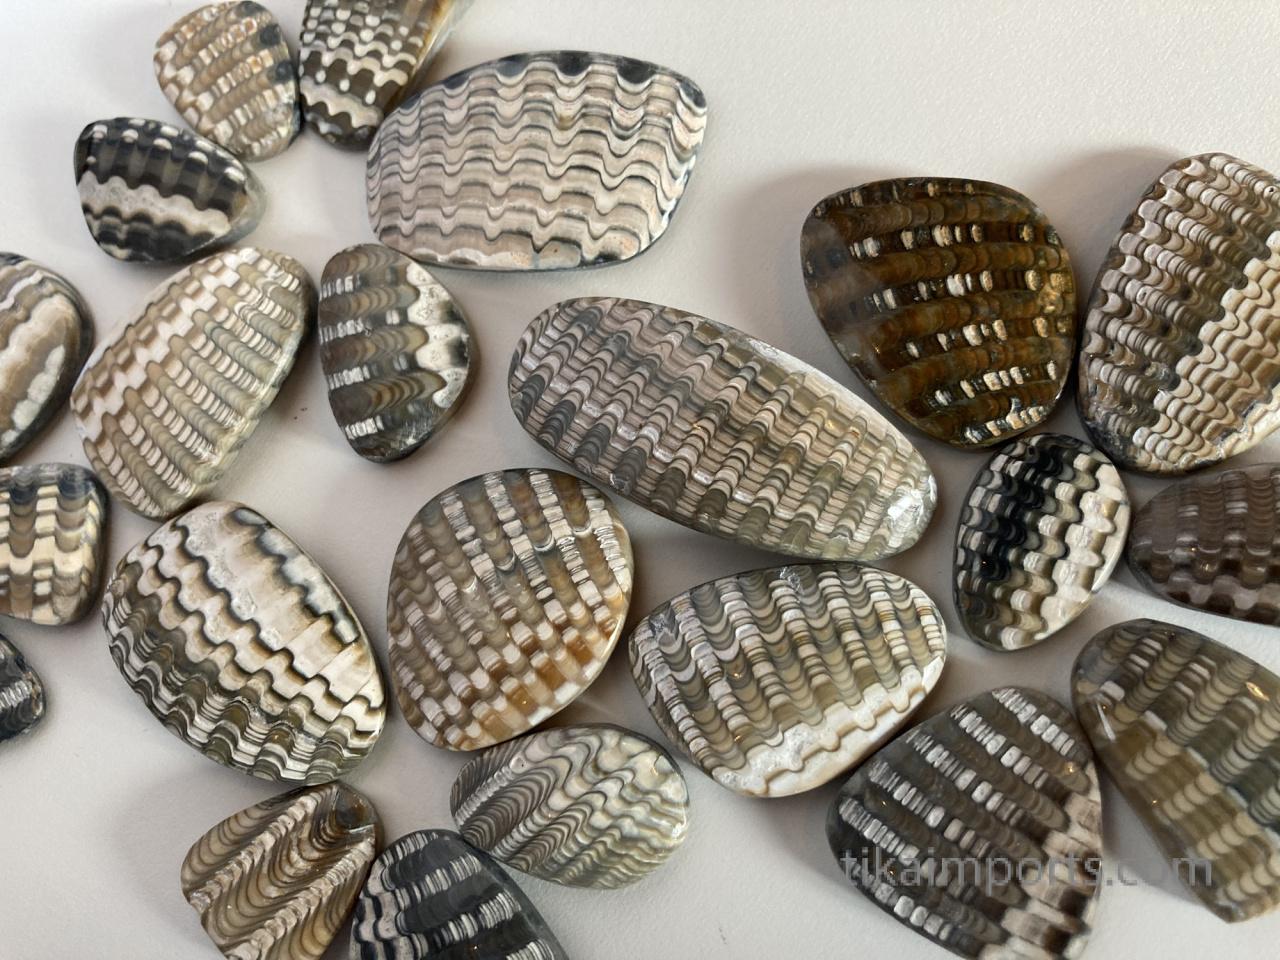 Anadara fossil shell cabochons